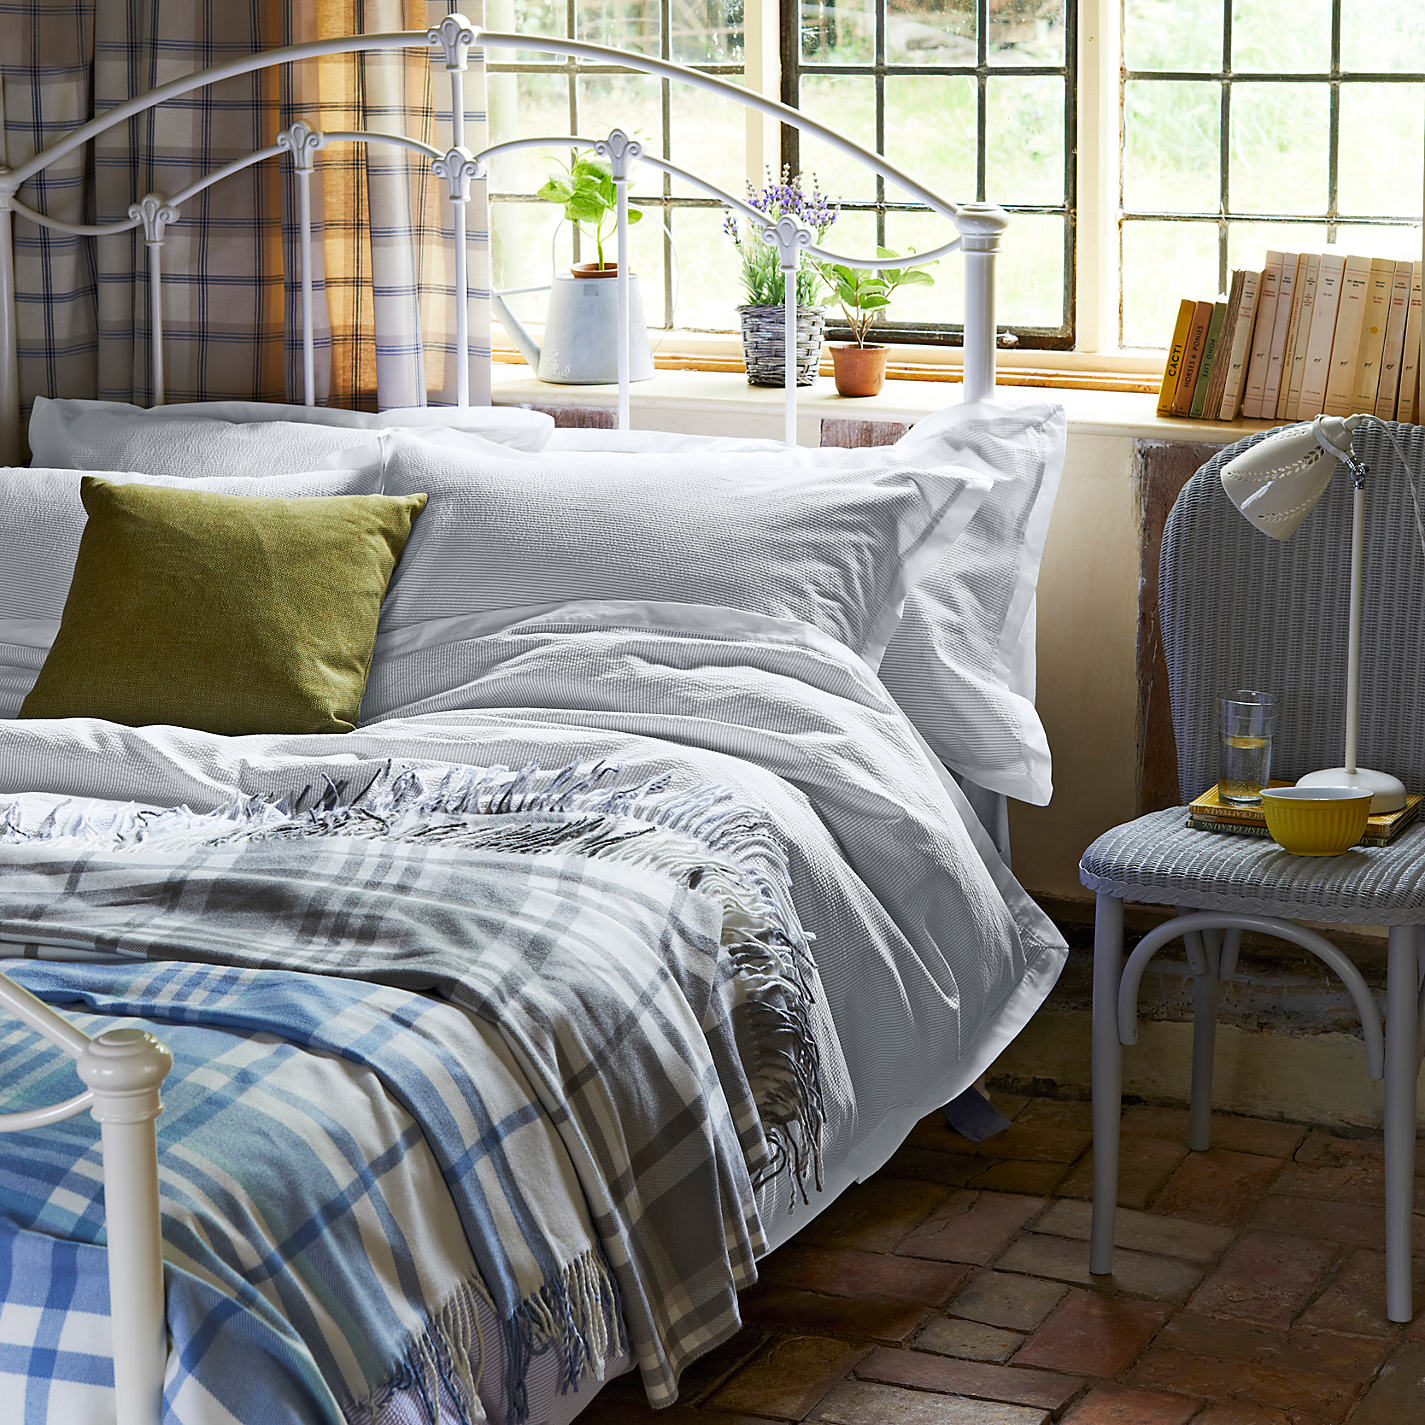 Baby cribs john lewis - Baby Bed John Lewis Buy John Lewis Daisy Bed Frame Cream Double Online At Johnlewis